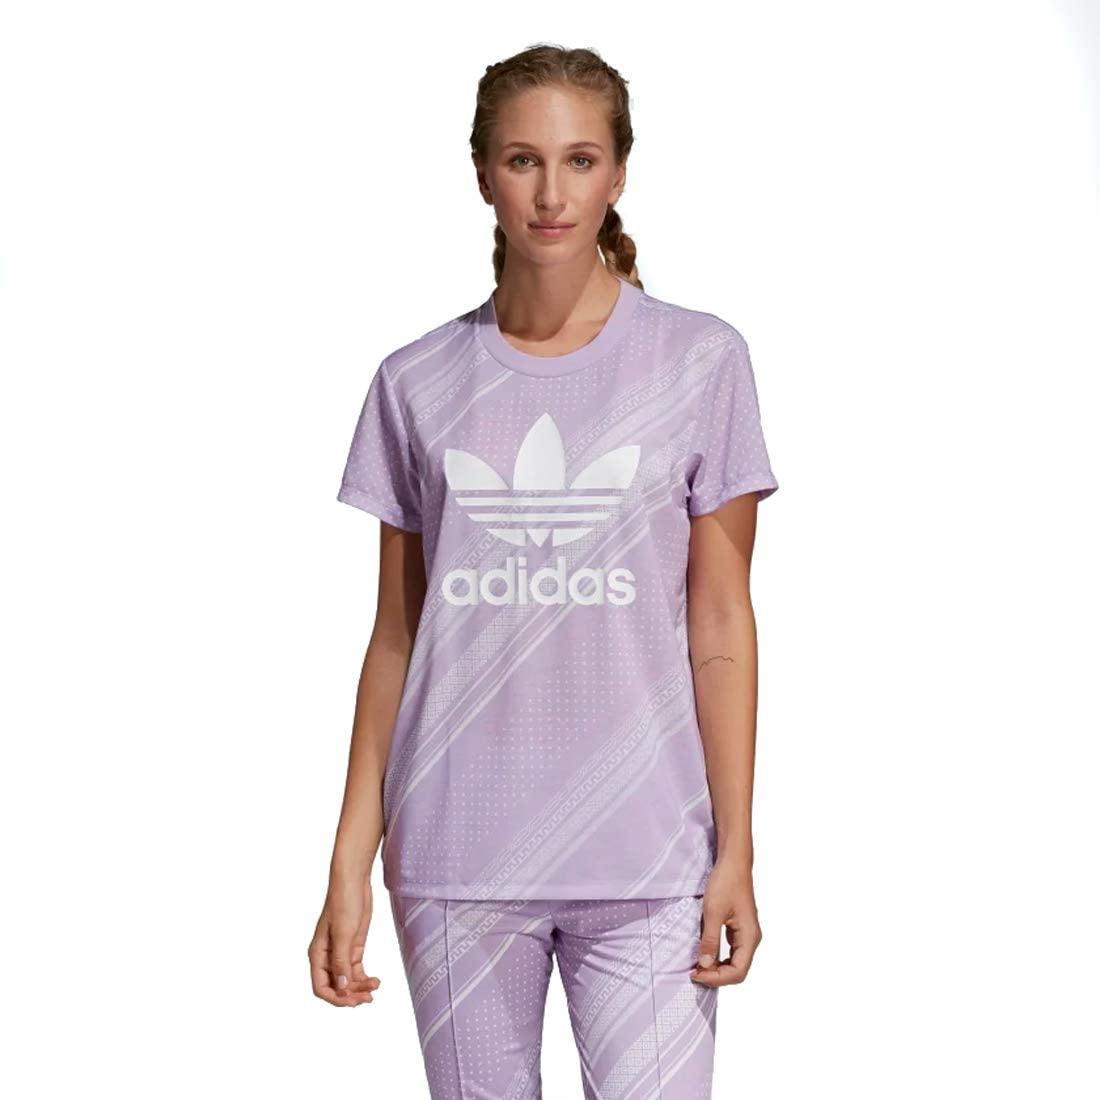 adidas Originals Women's Boyfriend Trefoil T-Shirt